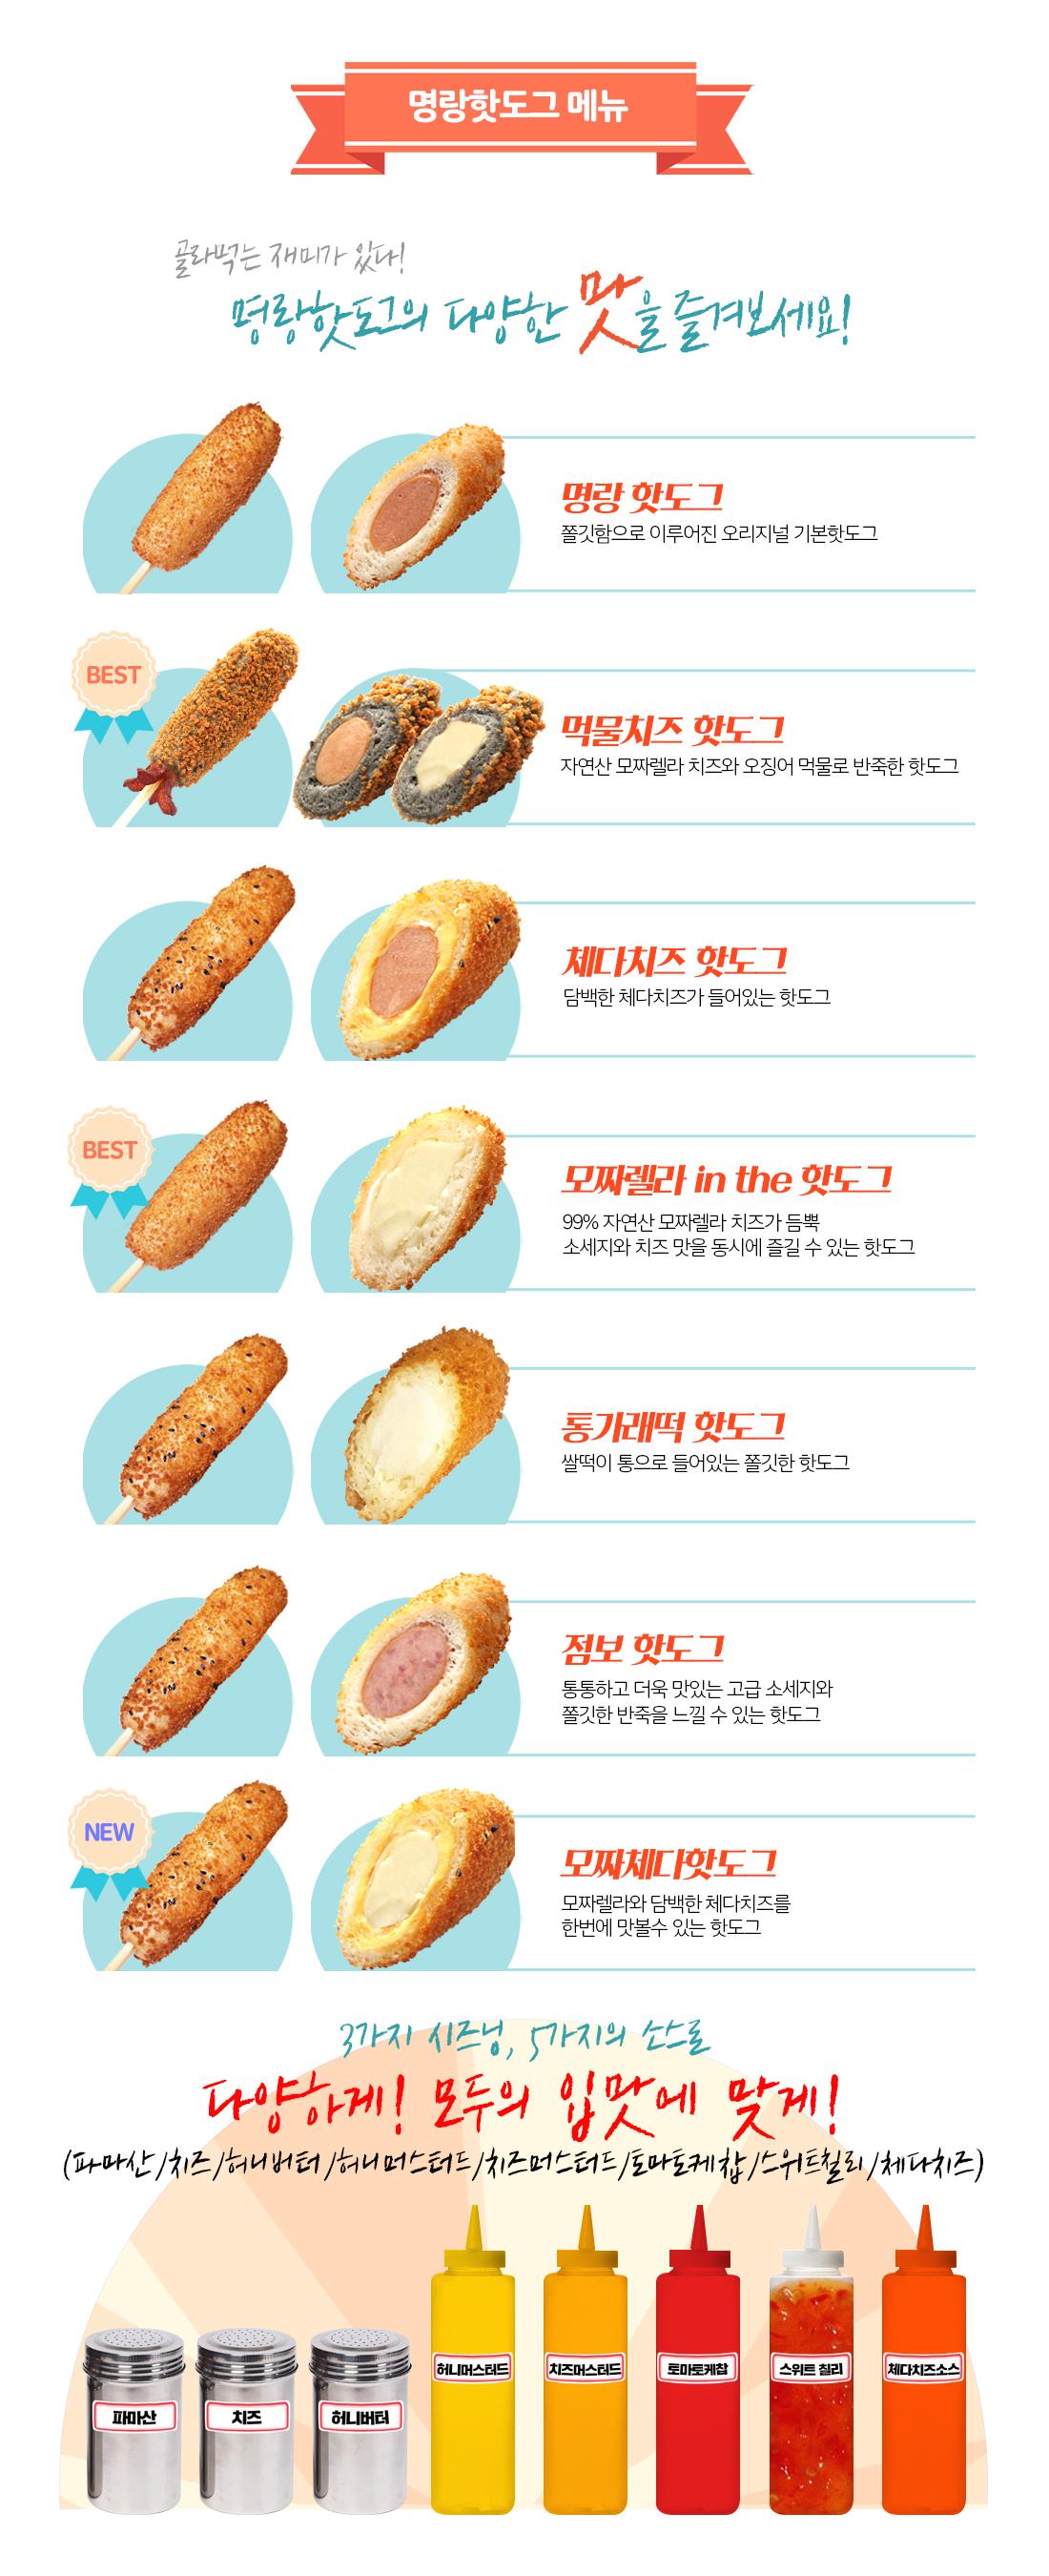 SAMPLE MENU - [1] Pick your Sausage (Classic/Spicy)[2] Choose from our specialty menu[3] Top it off with your favorite sauceSpecialty Hot Dogs_Classic: 찹쌀의 쫄깃함과 두겹의 바삭한 튀김을 깔끔하게 맛볼 수 있는 시그니처 핫도그French Dog:바삭한 감자튀김이 쫄깃한 찹쌀과 함께 어울어지는 든든한 인기 메뉴Octo Dog:직접 만드는 먹물치즈 반죽과 모짜렐라 치즈가 어울어지는 대표 비주얼 메뉴Mozza Dog:끝없이 늘어나는 모짜렐라 치즈가 가득한 최고 인기 메뉴Cheddar Dog:체다 치즈를 듬직한 소시지에 통째로 감싸 부드럽고 고소한 어메리칸 메뉴Bacon Dog:풍성한 베이컨이 둘러진 비주얼 끝판왕 메뉴Sauces_Ketchup // Sweet Chili // Honey Mustard // Cream Cheese // Cheese Mustard // SrirachaPowders_Parmesan // Honey Butter // Onion // Cheese